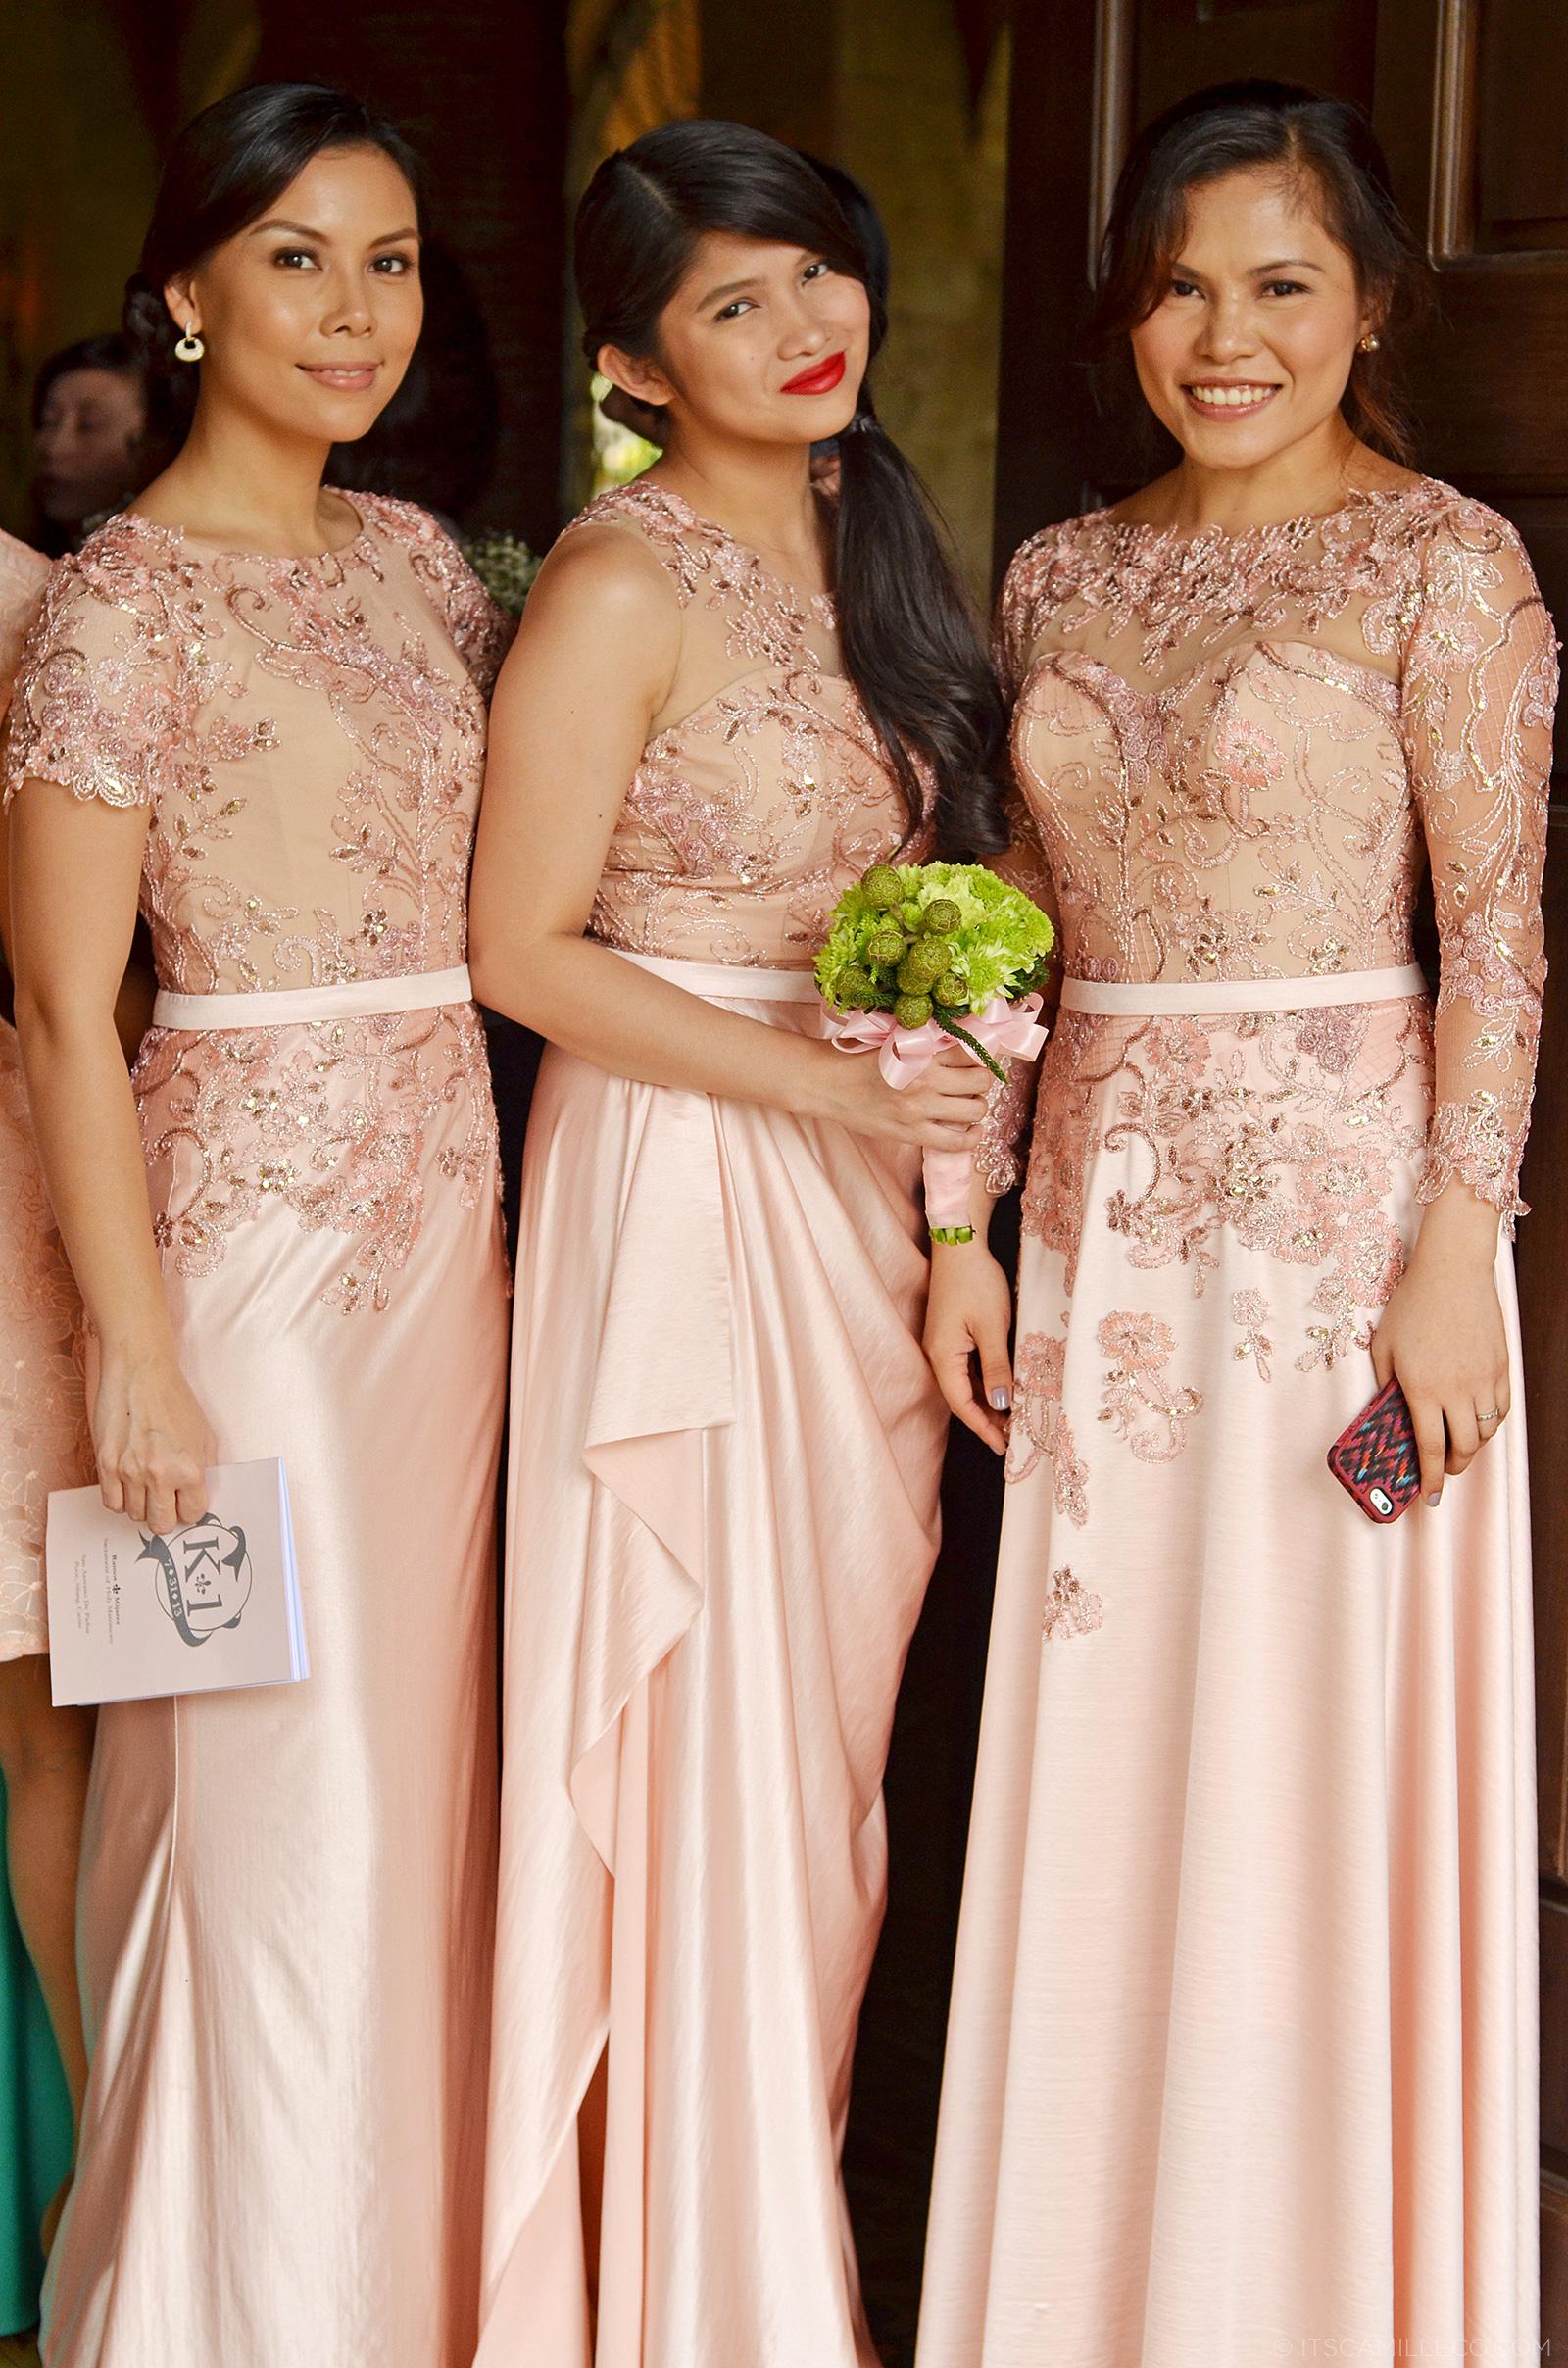 cheap wedding gowns for rent manila wedding dress for rent Cheap Wedding Gowns For Rent Manila 55